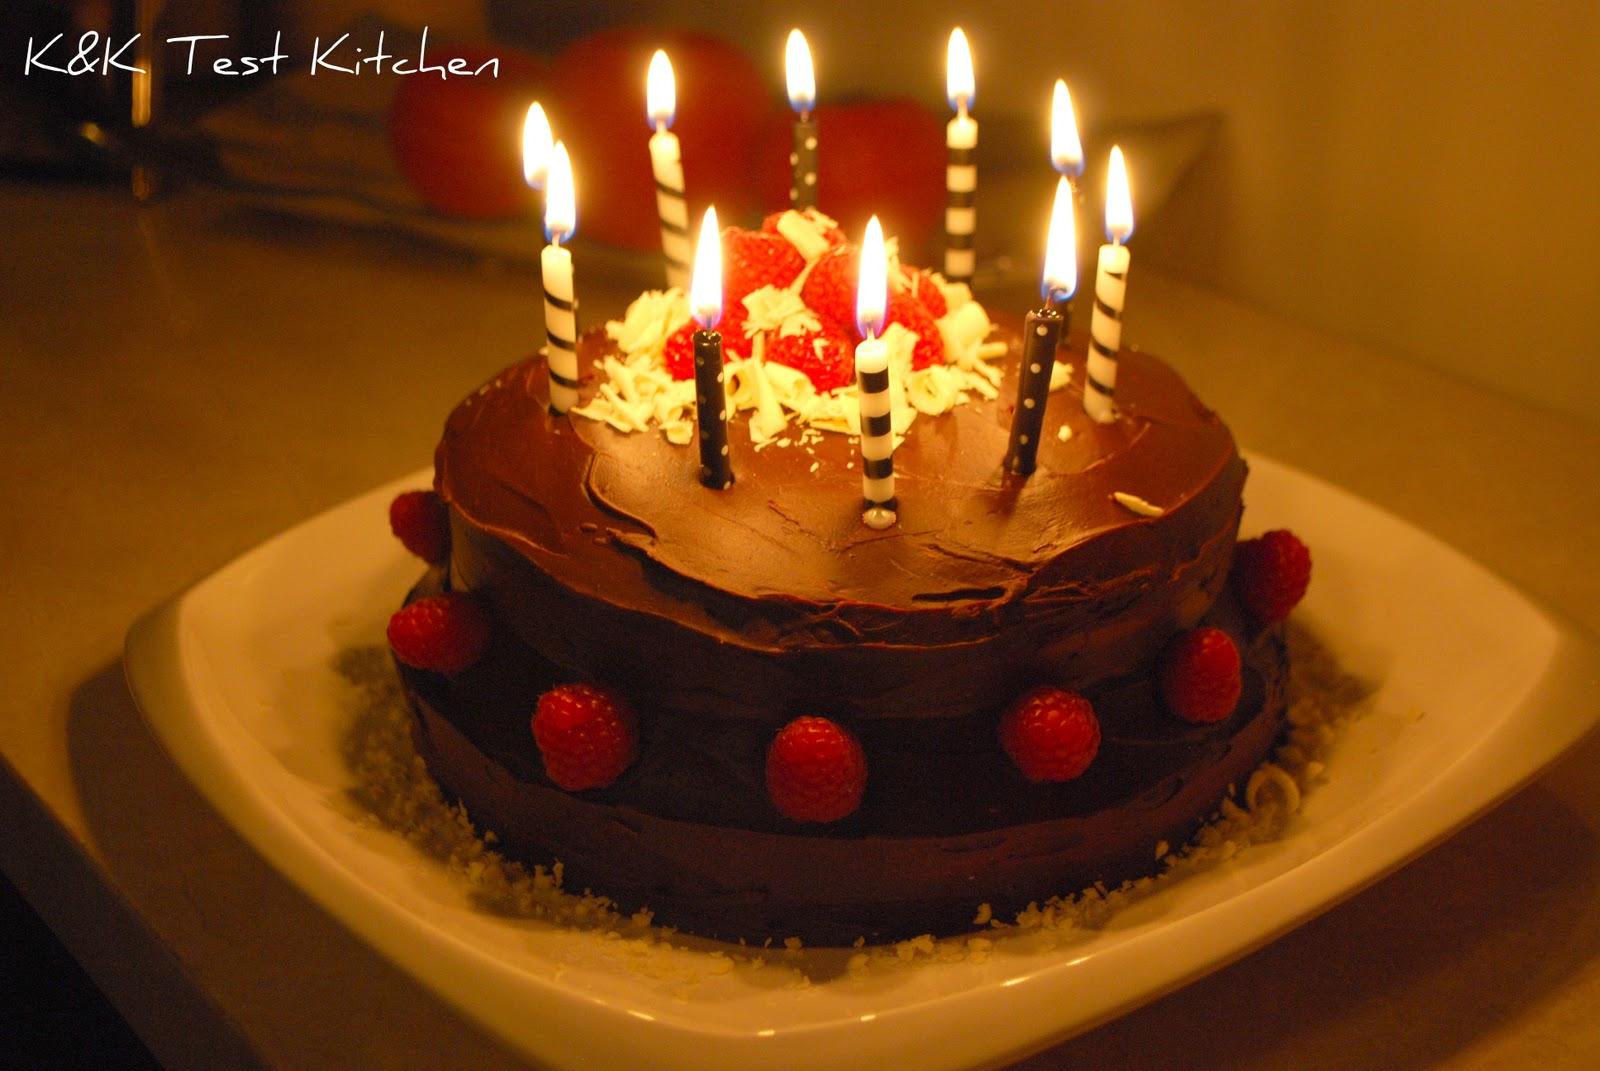 KK Test Kitchen Birthday Cake White Chocolate with Raspberry